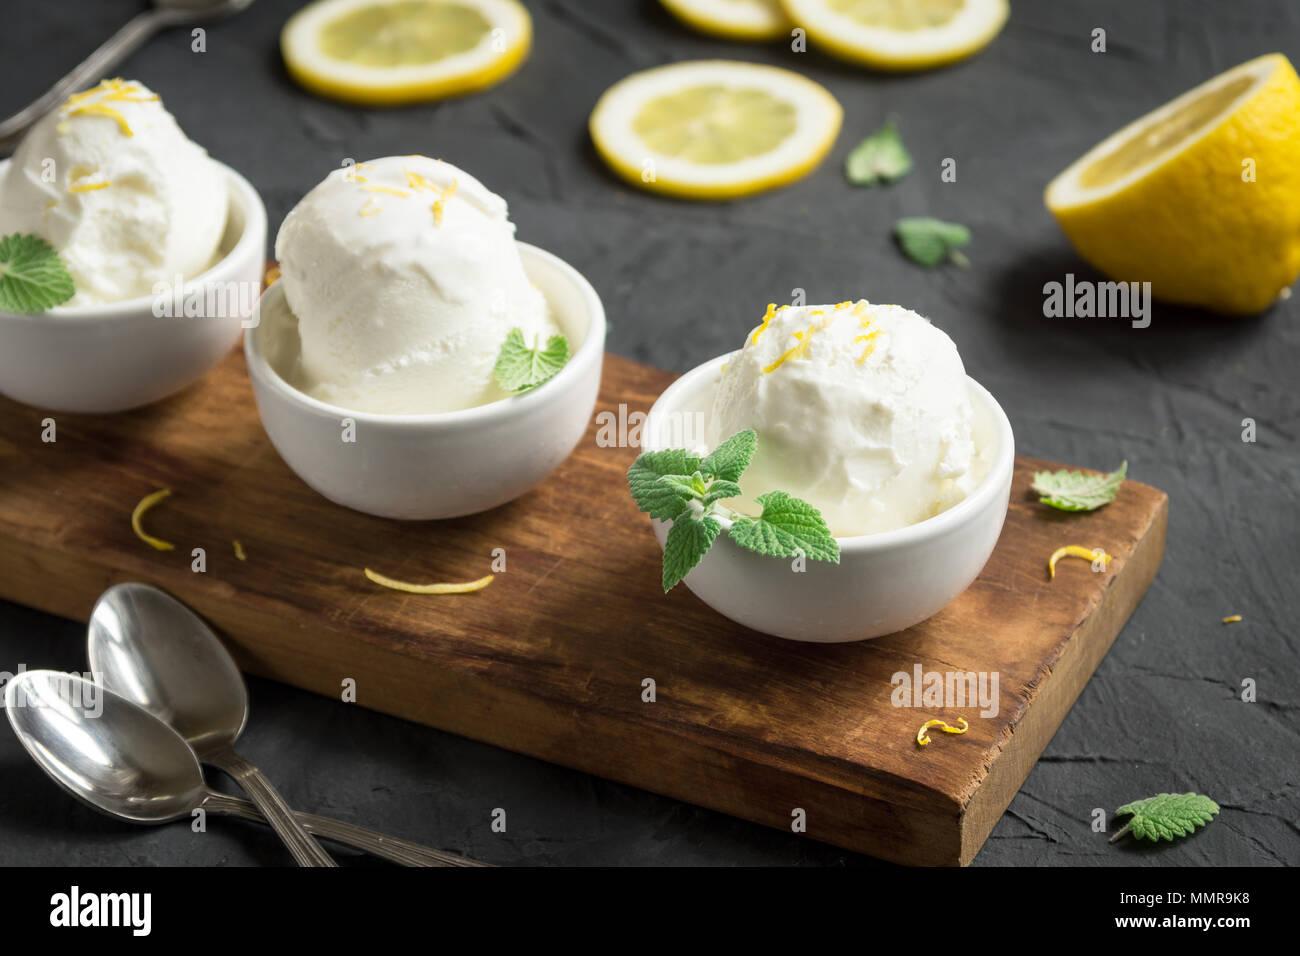 Lemon Ice Cream in bowl. Homemade citrus lemon ice cream (gelato) with mint close up. - Stock Image